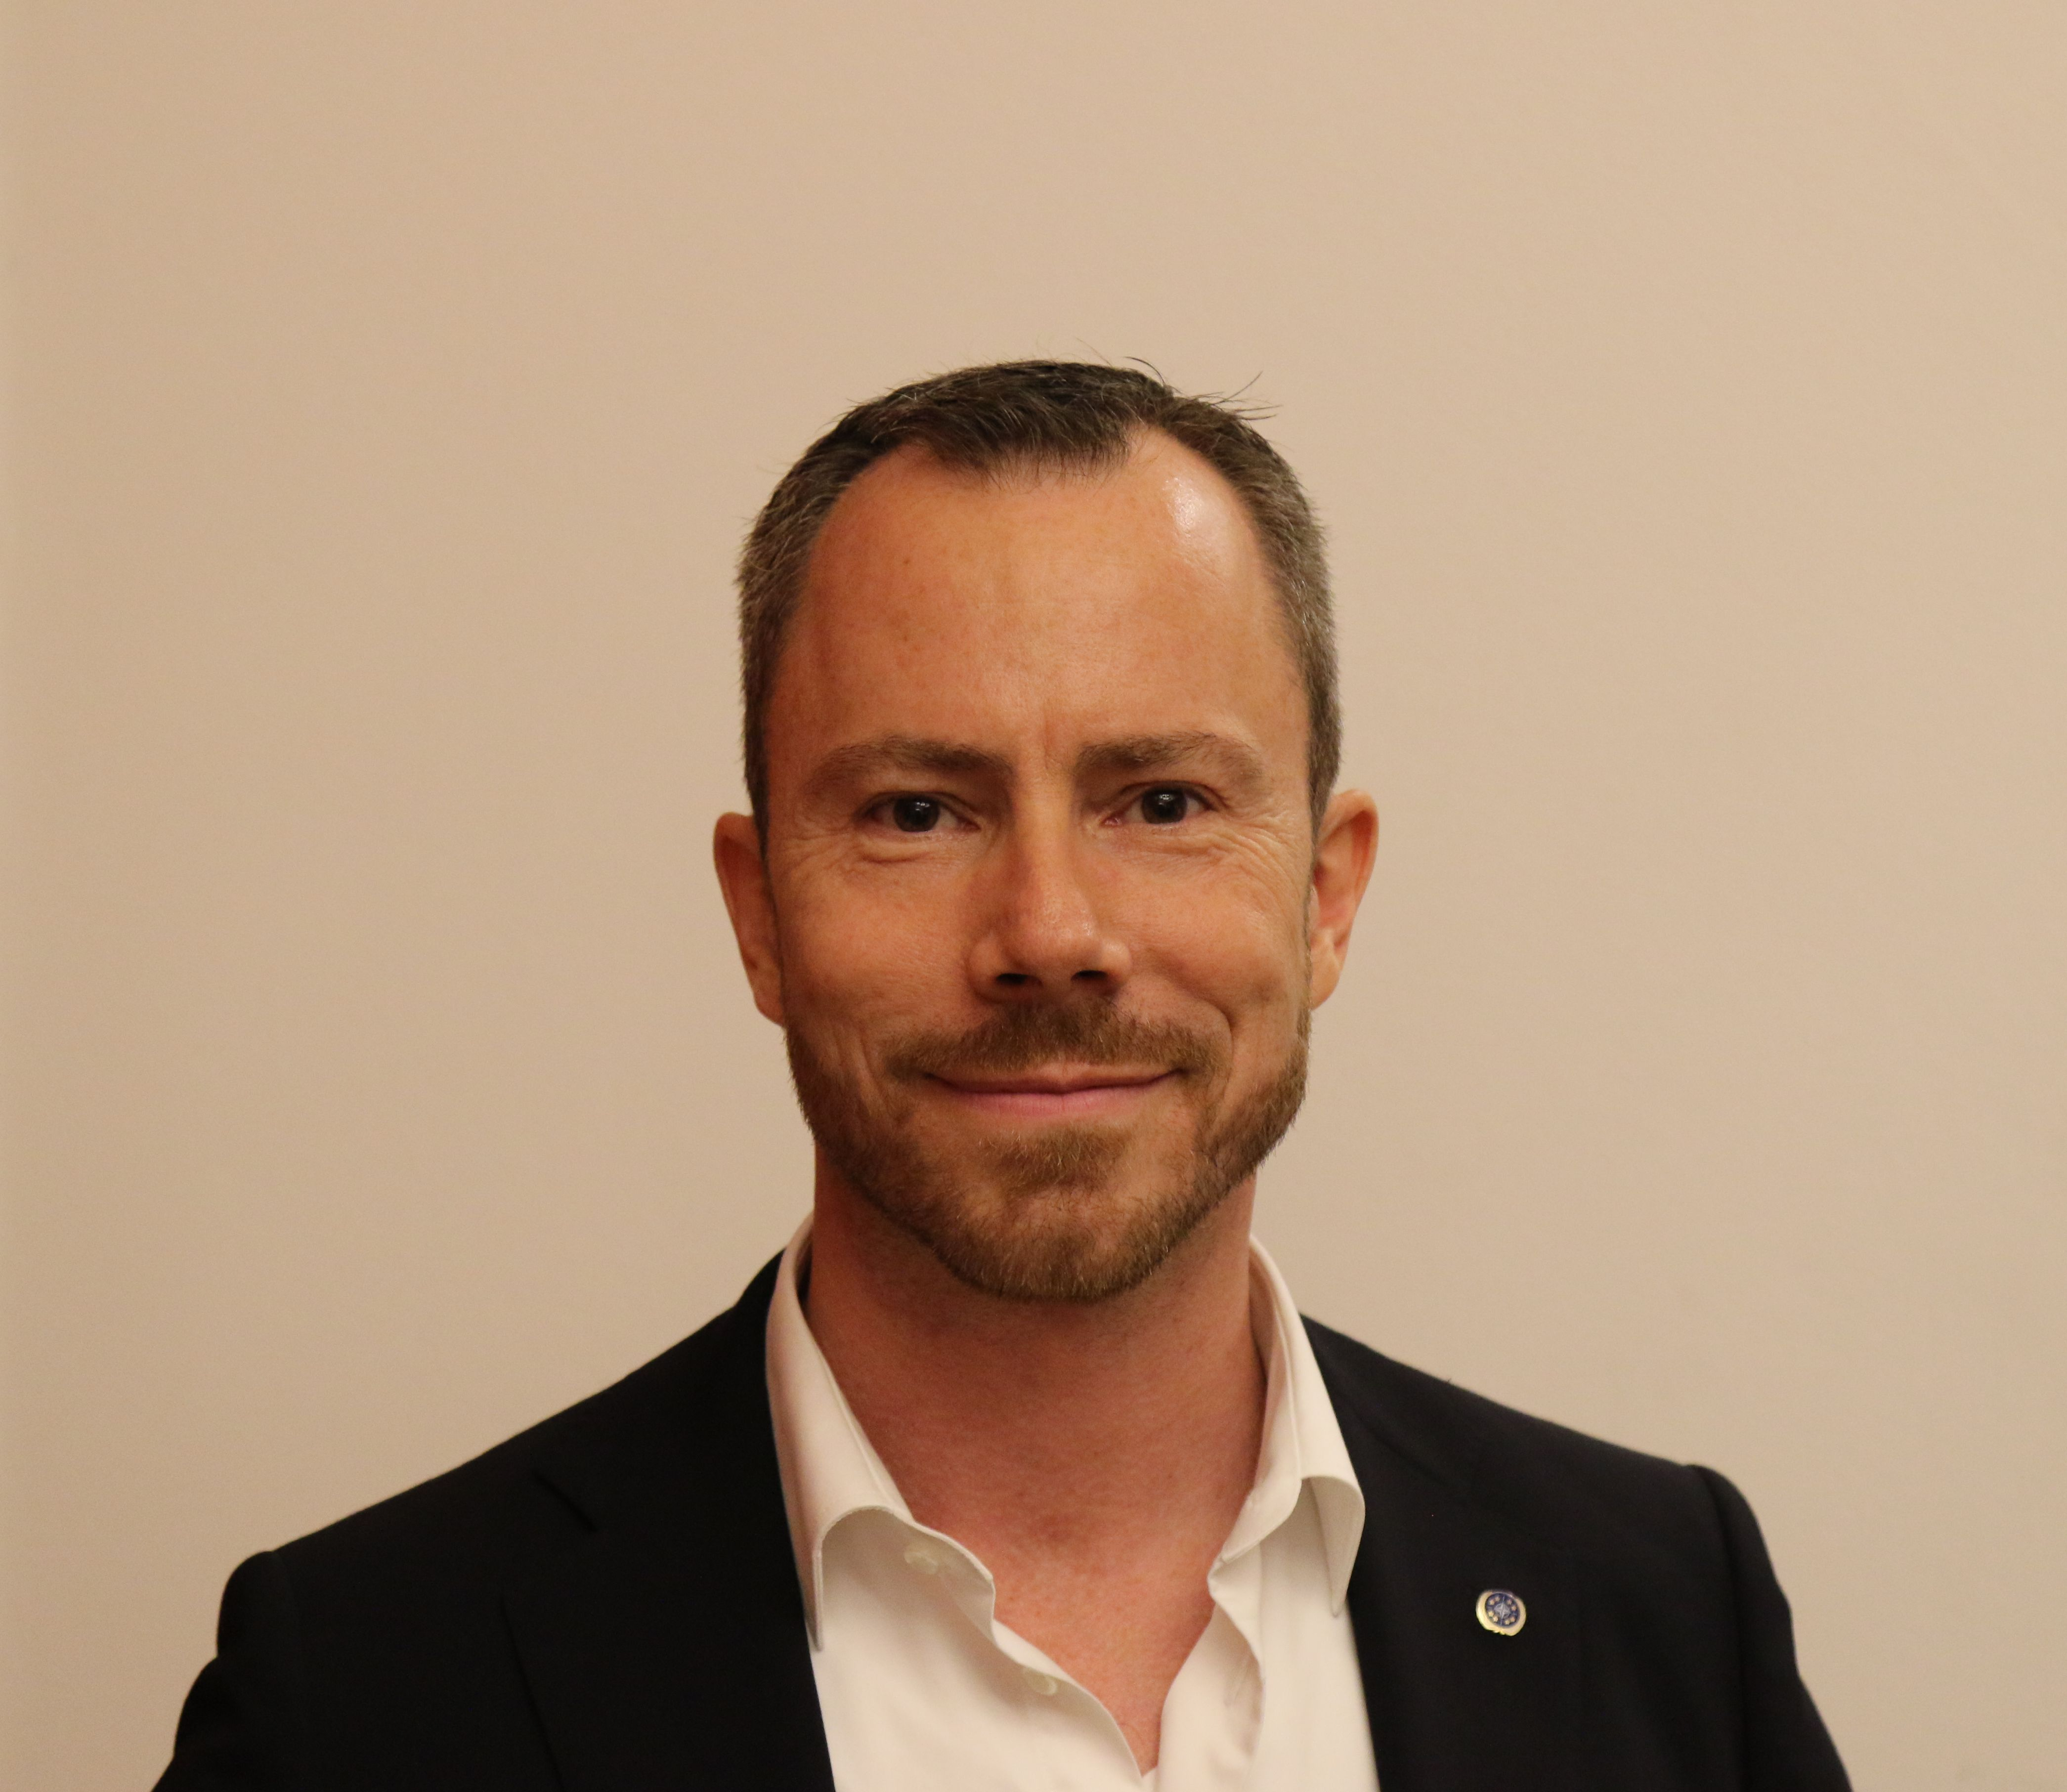 Jakob Ellemann Jensen Wikipedia